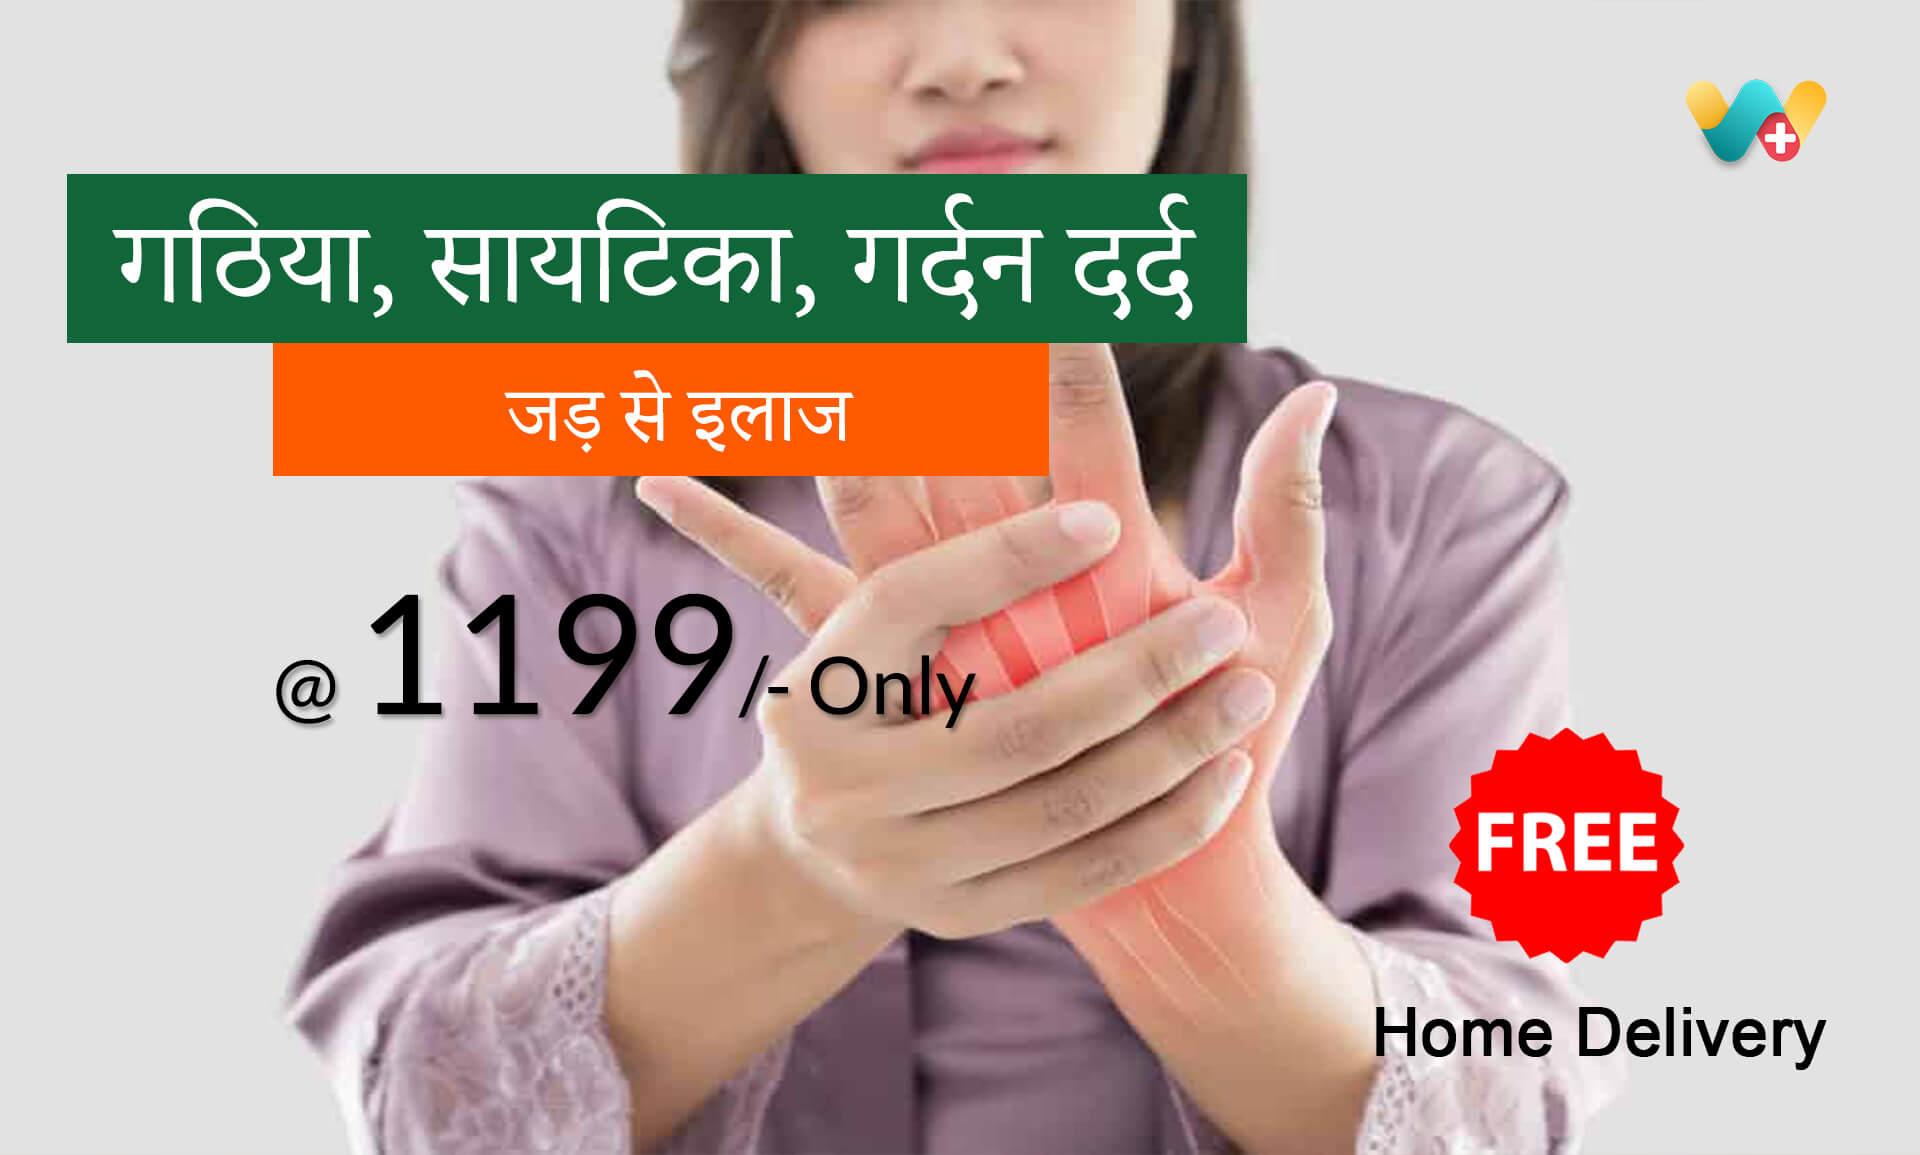 Arthritis Treatment WeClinic Homeopathy